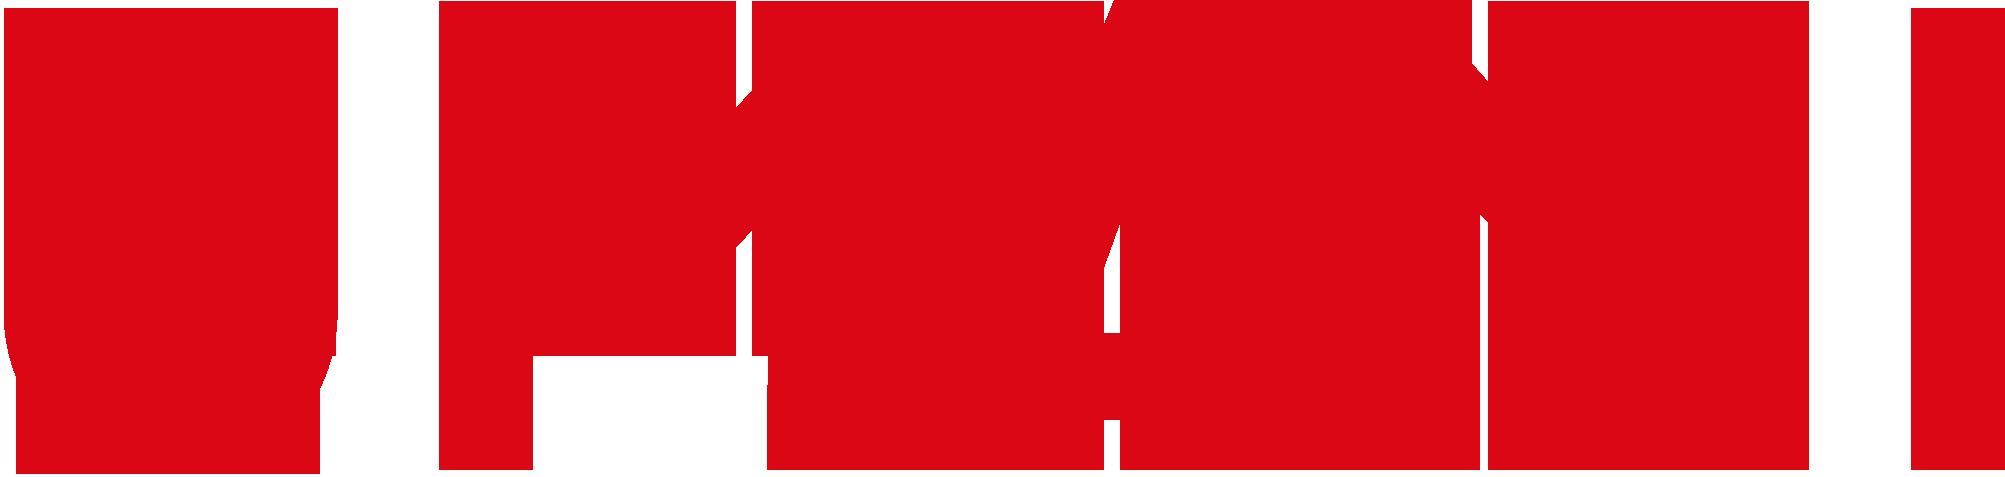 UMAMI Group